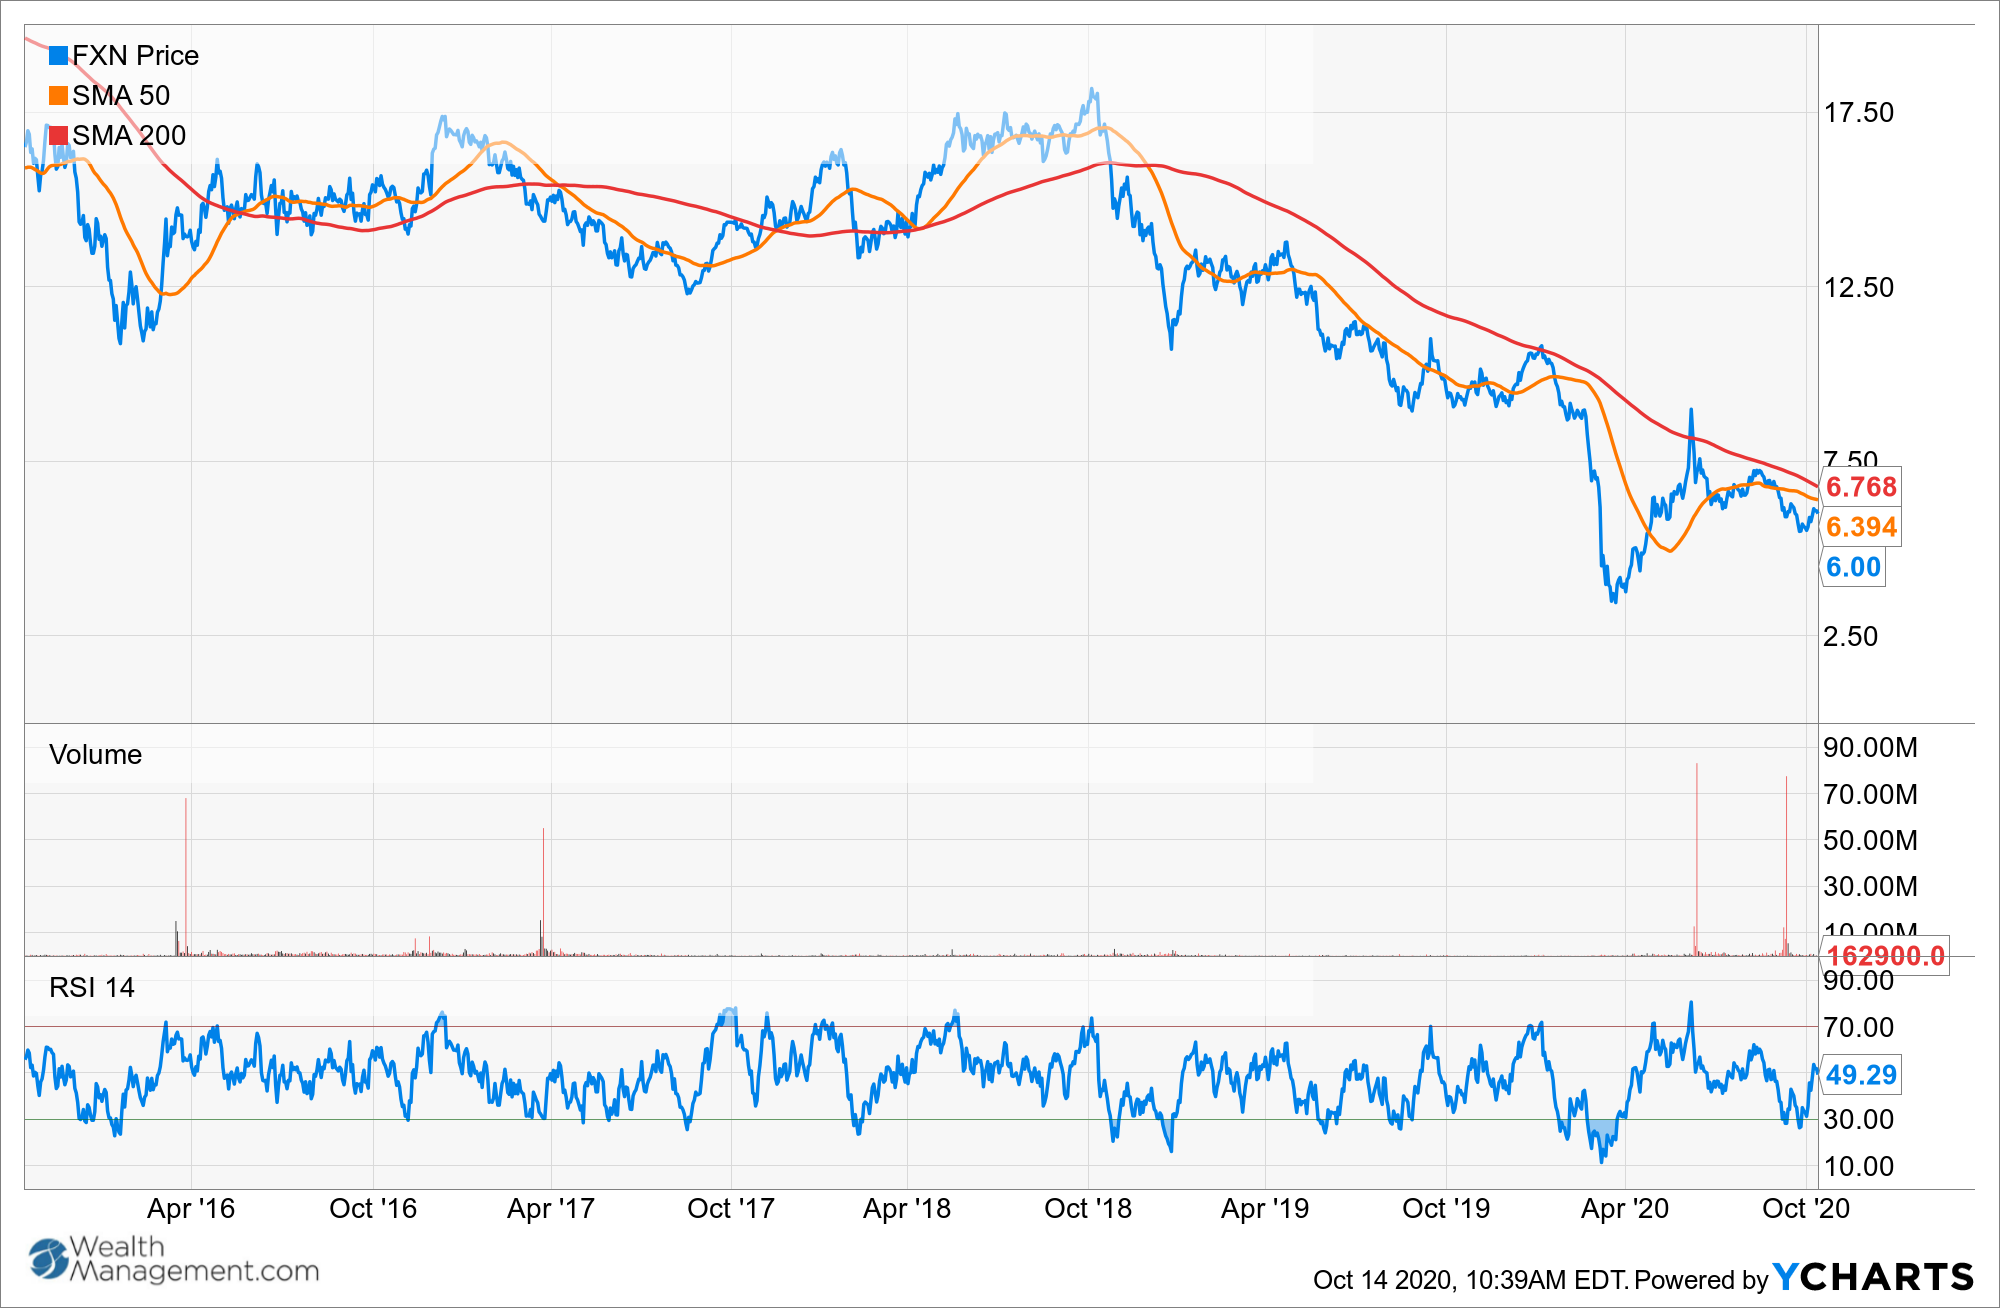 FXN Chart